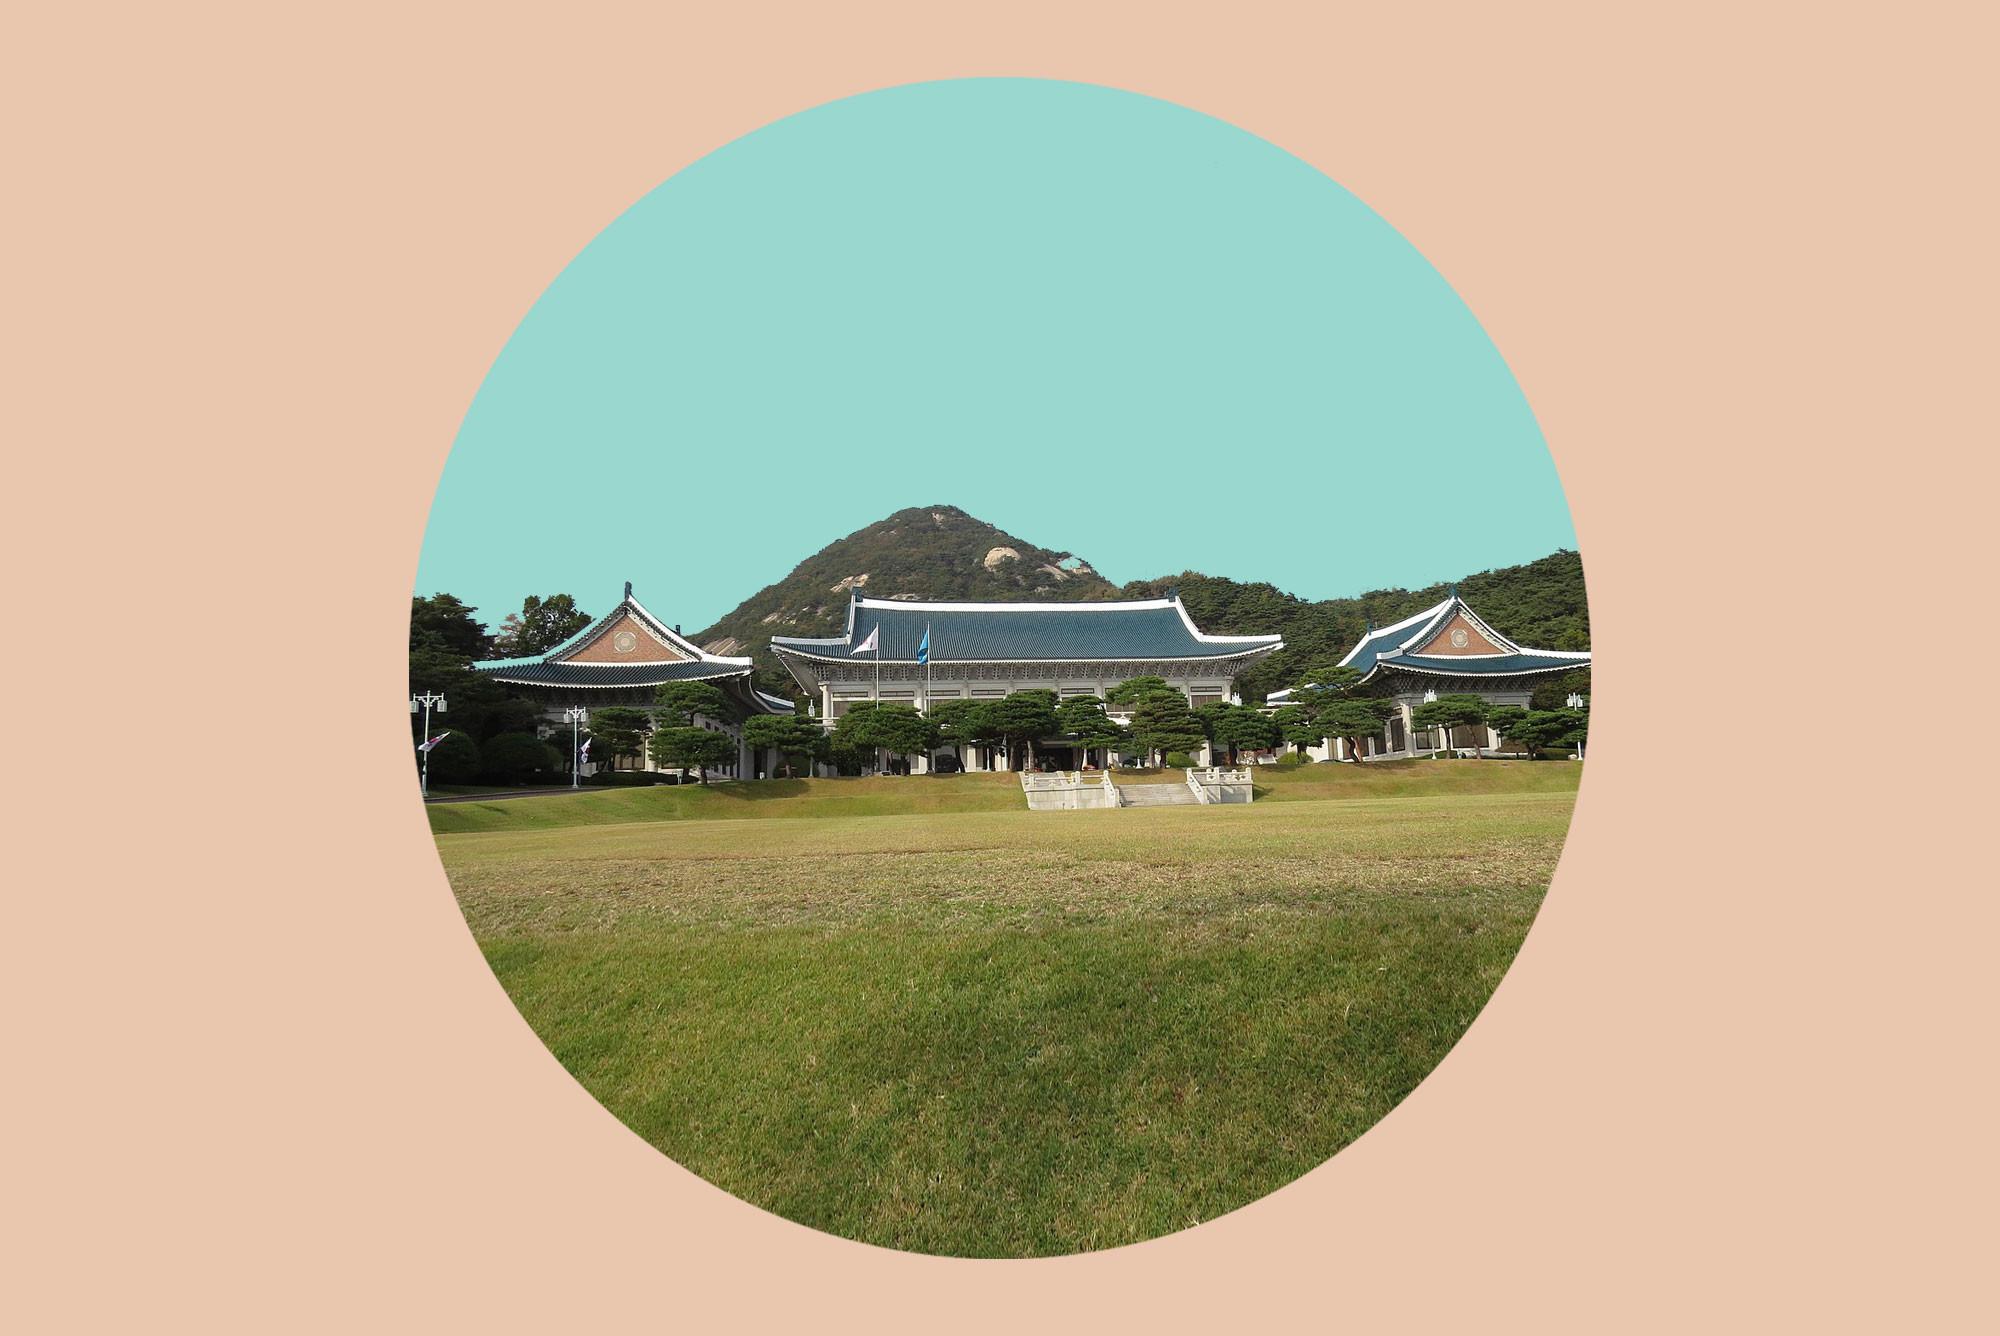 Голубой дом, правительственная резиденция. Коллаж © L!FE Фото: © Wikipedia.org